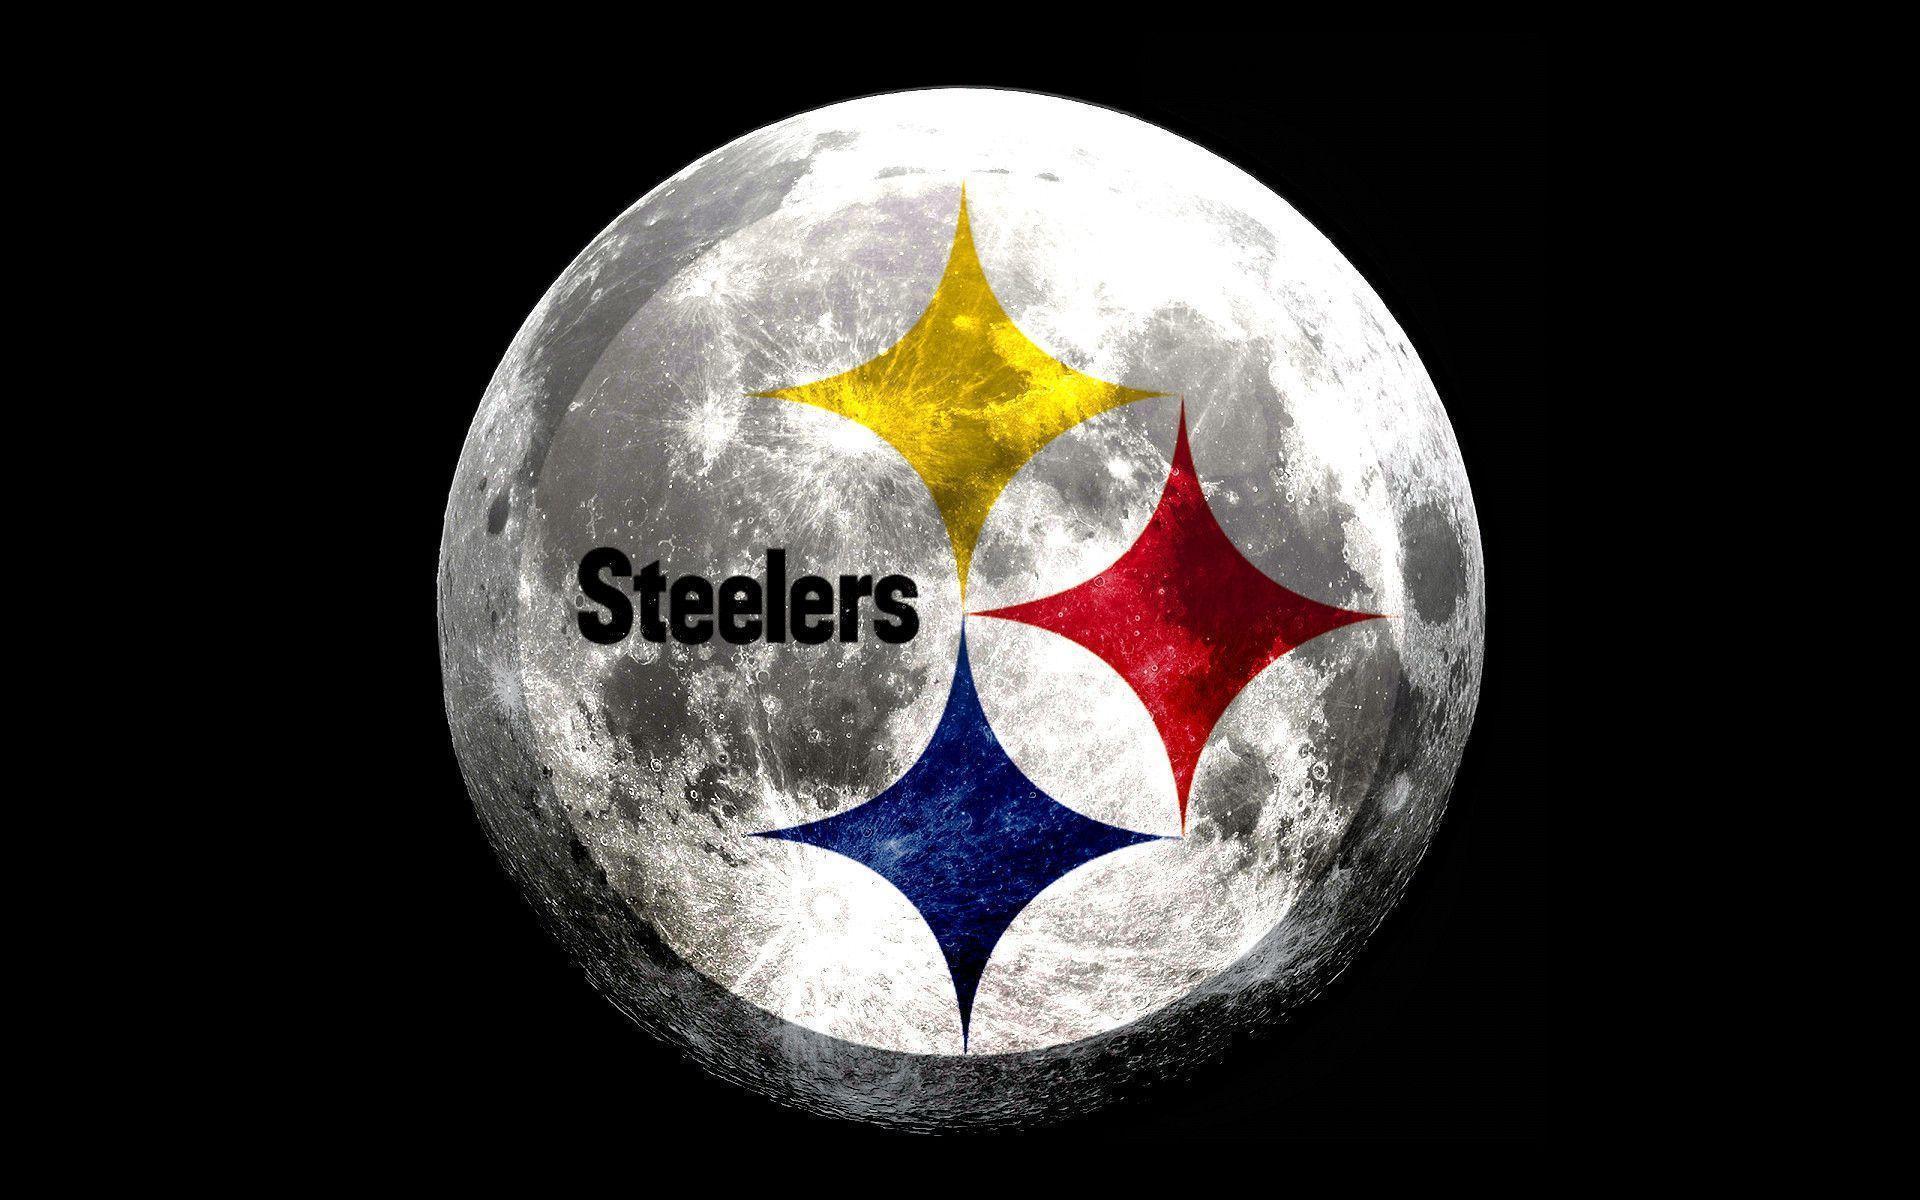 Steelers Wallpapers - Full HD wallpaper search